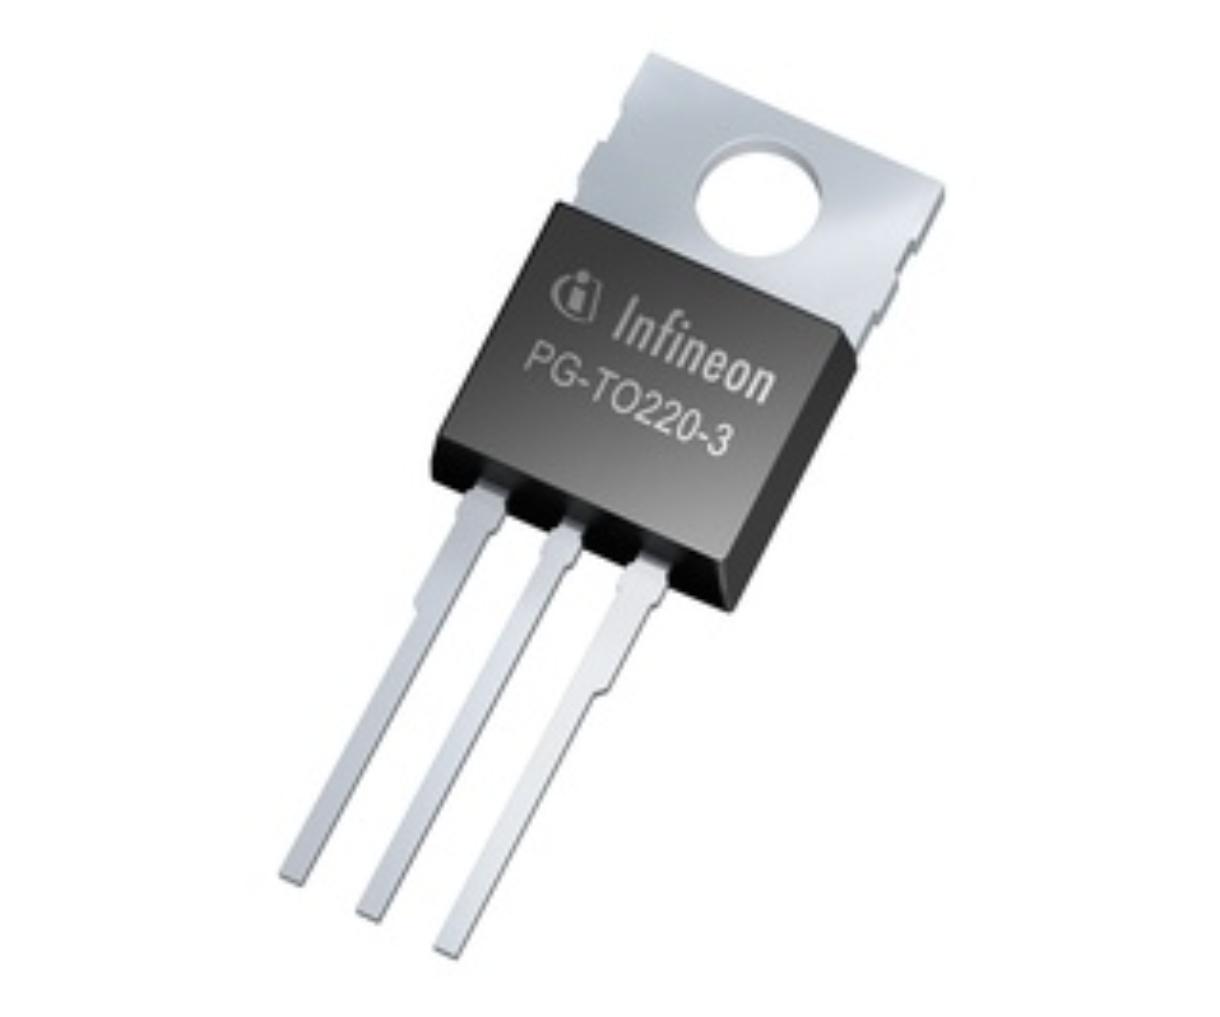 Ipp45p03p4l 11 Infineon Technologies Solydine M28 Wiring Diagram 01 00 2008 12 05 Pdf 169 Kb